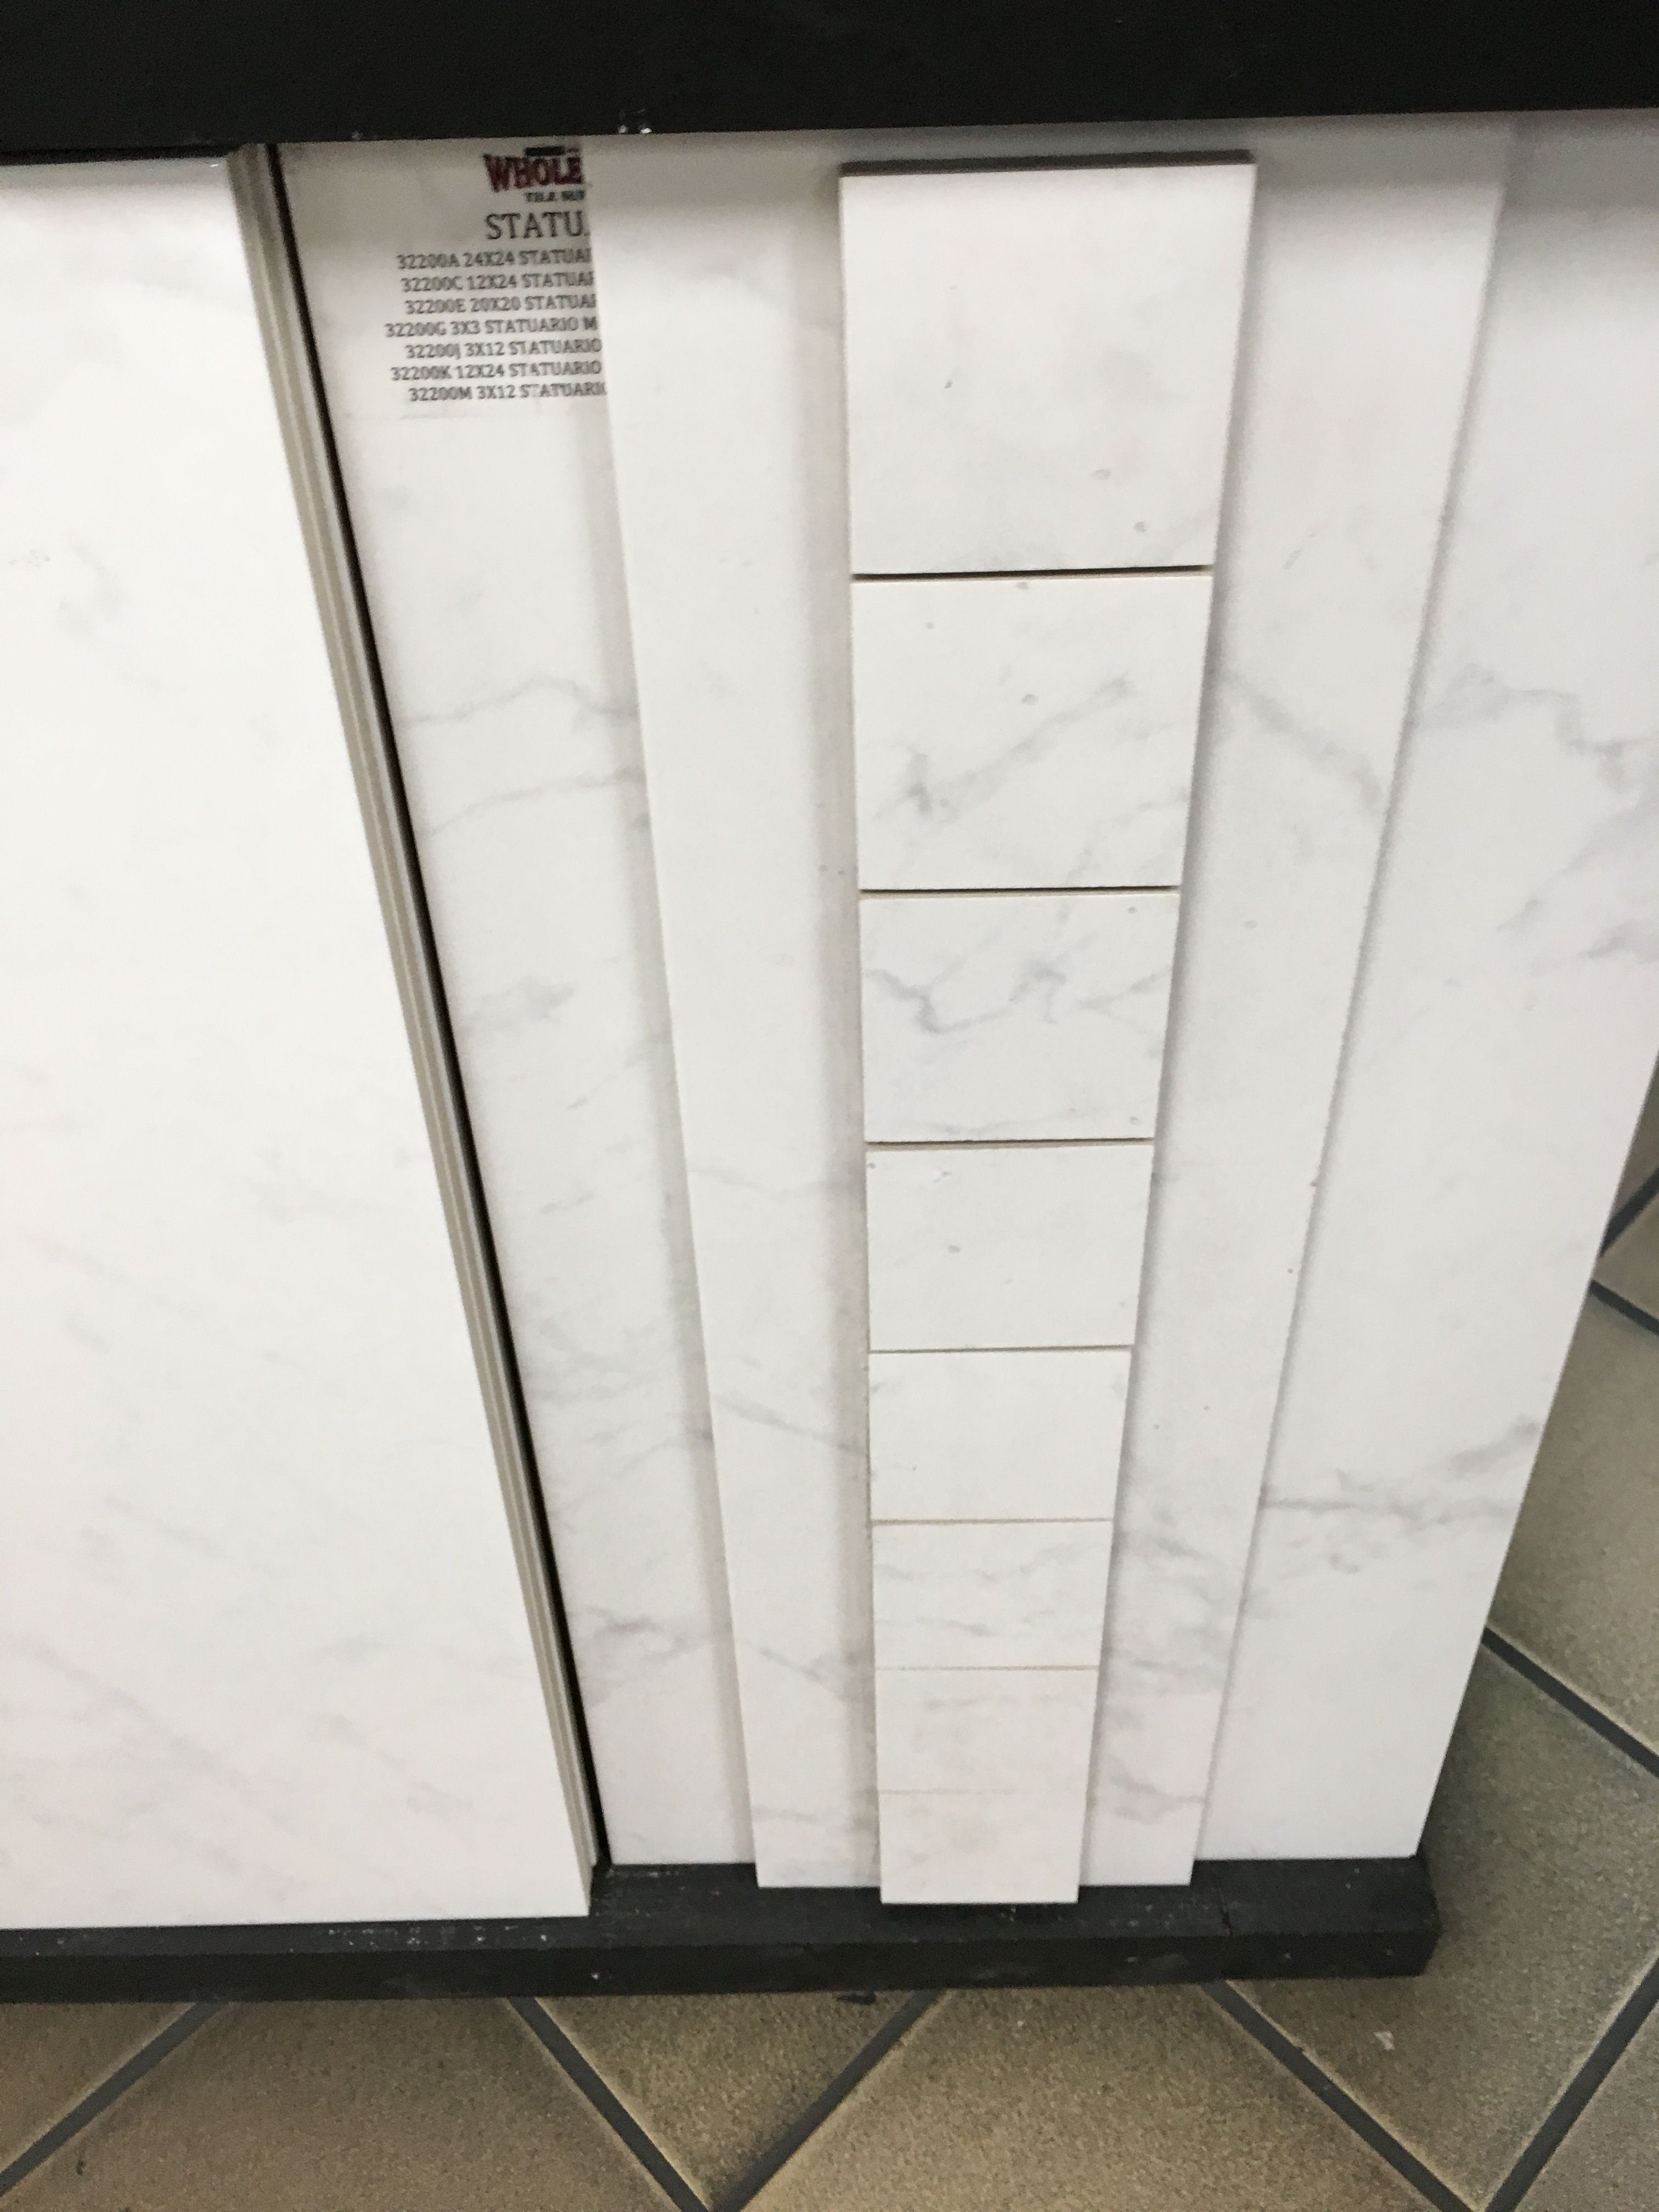 Statuario 3 X3 Shower Floor Tile From Sarasota Whole